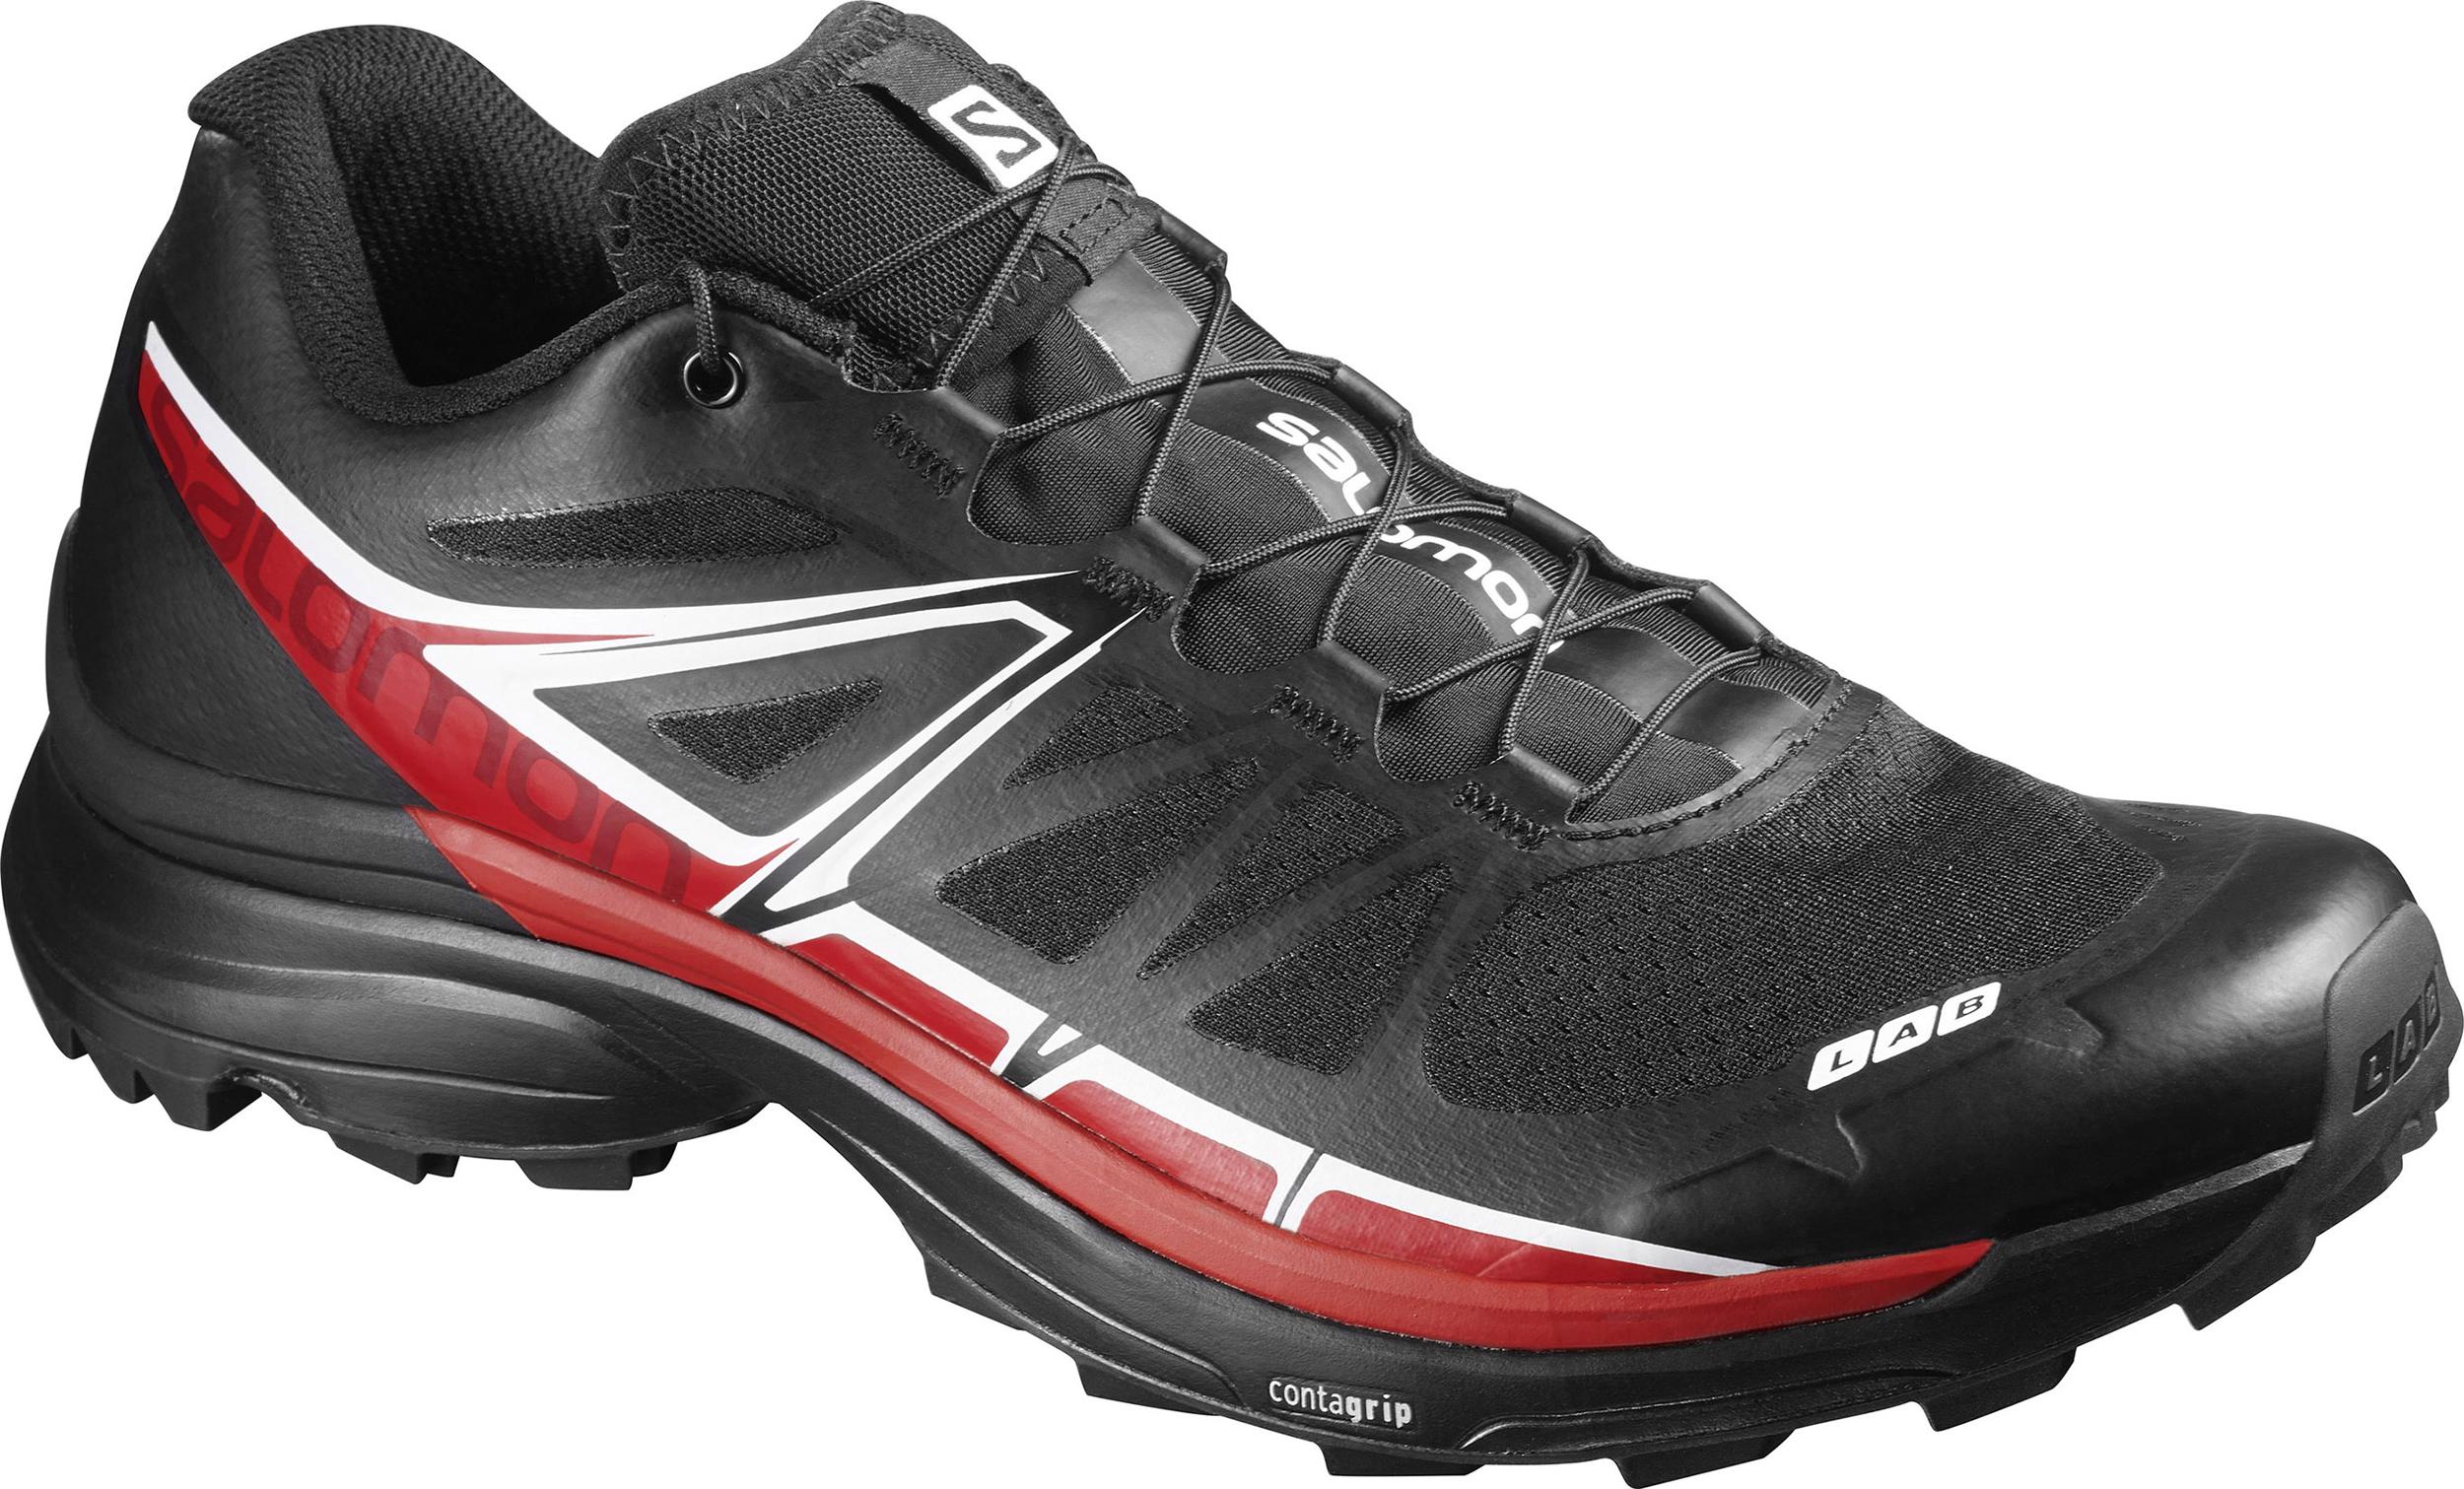 separation shoes c8cd6 f8789 Salomon S-Lab Wings SG Trail Running Shoes - Men's | MEC